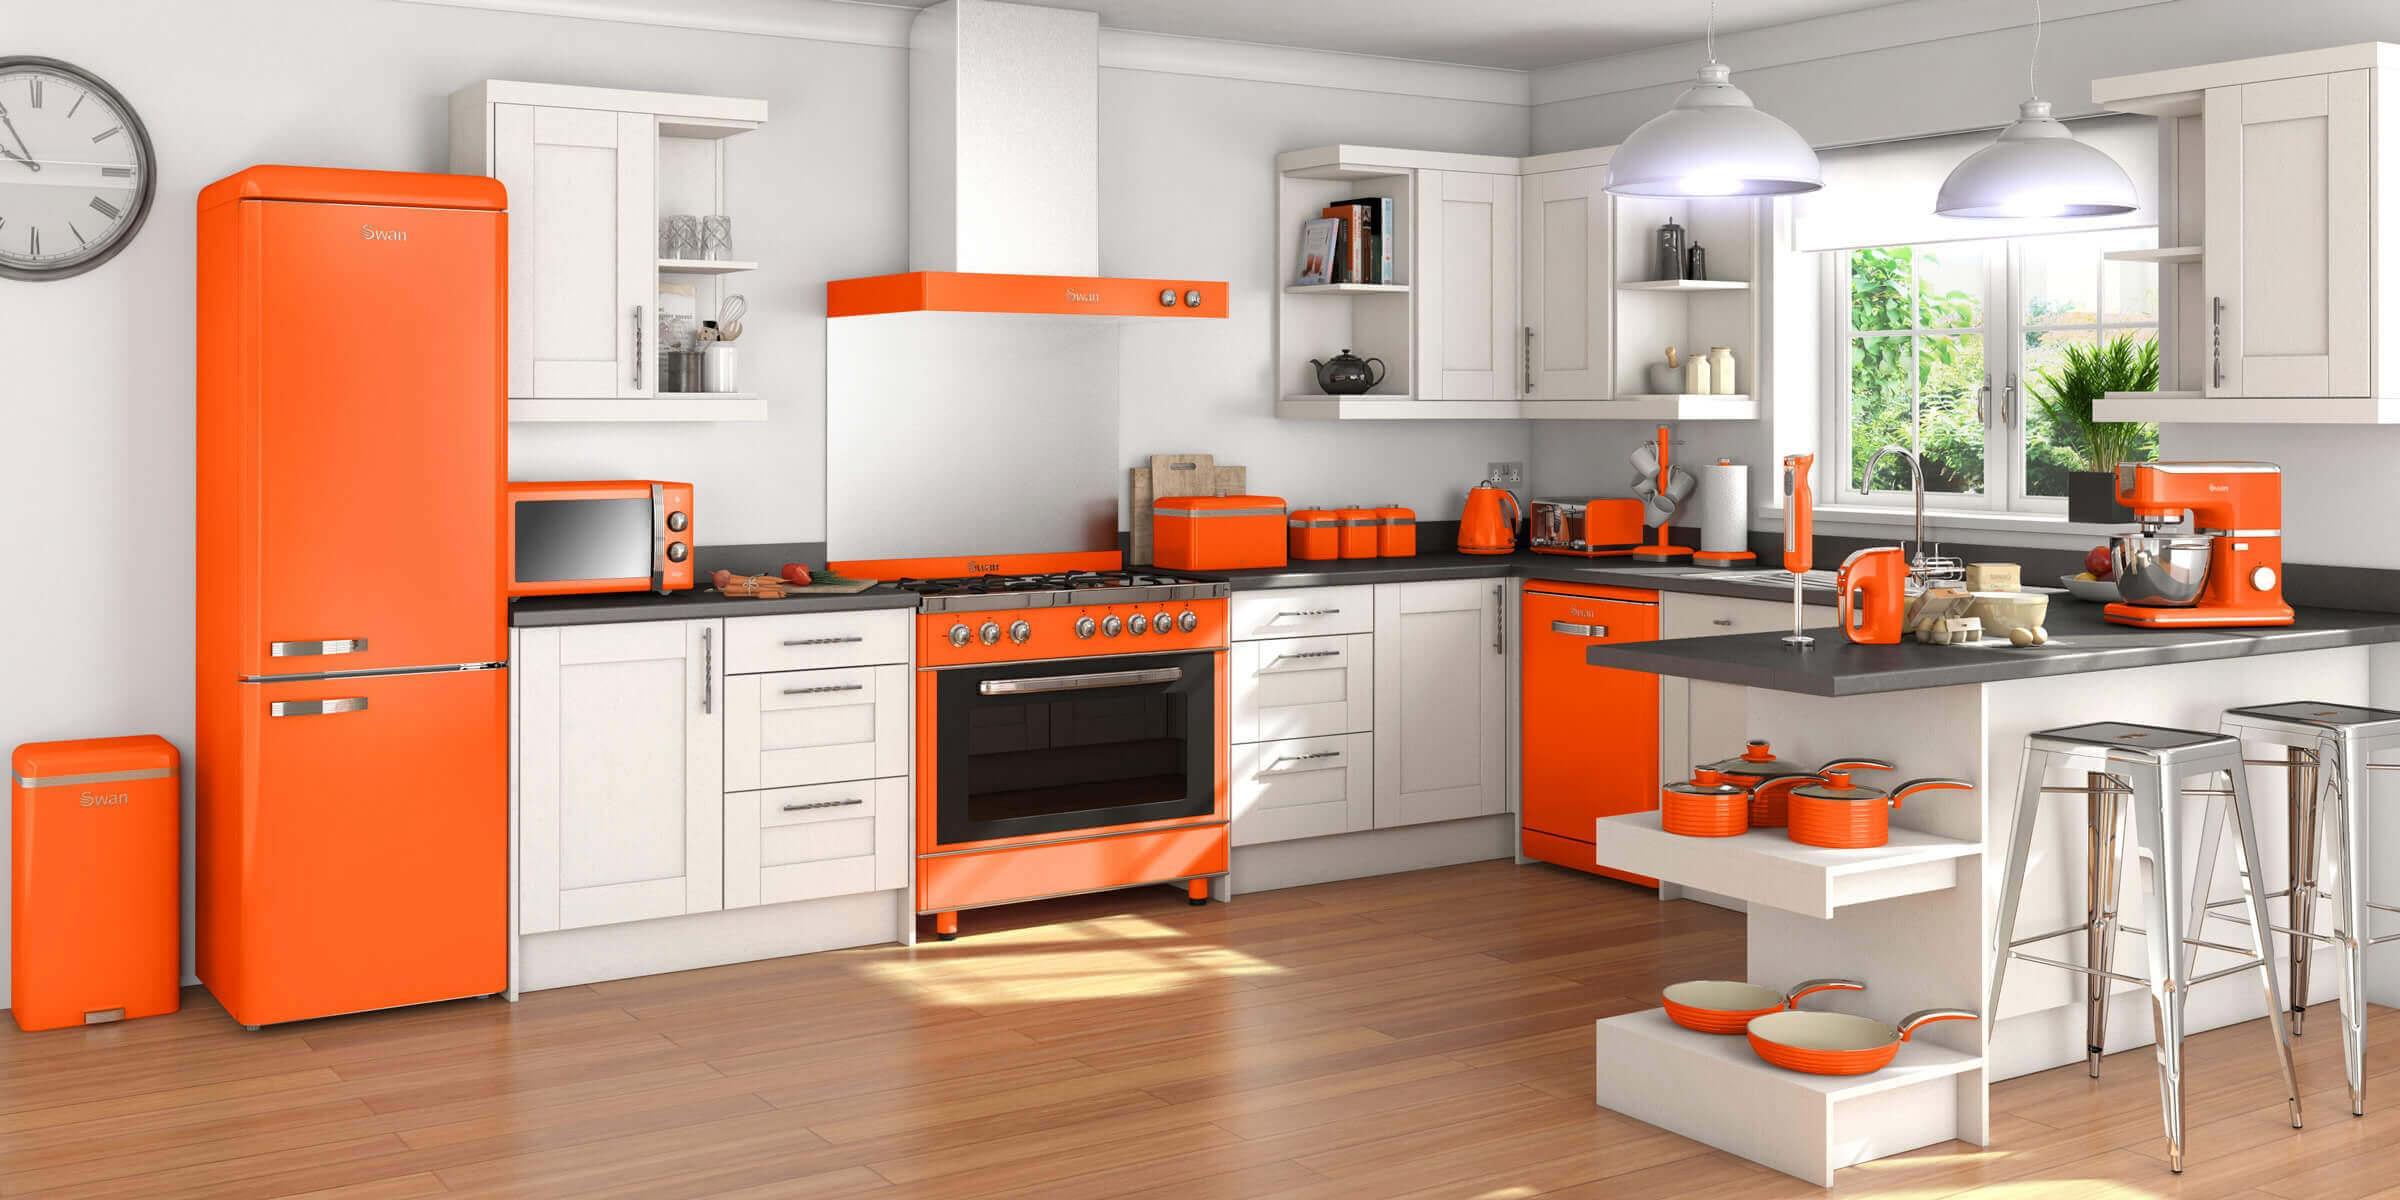 Swan Fearne Mixers Amp Blenders Retro Appliances Ao Com